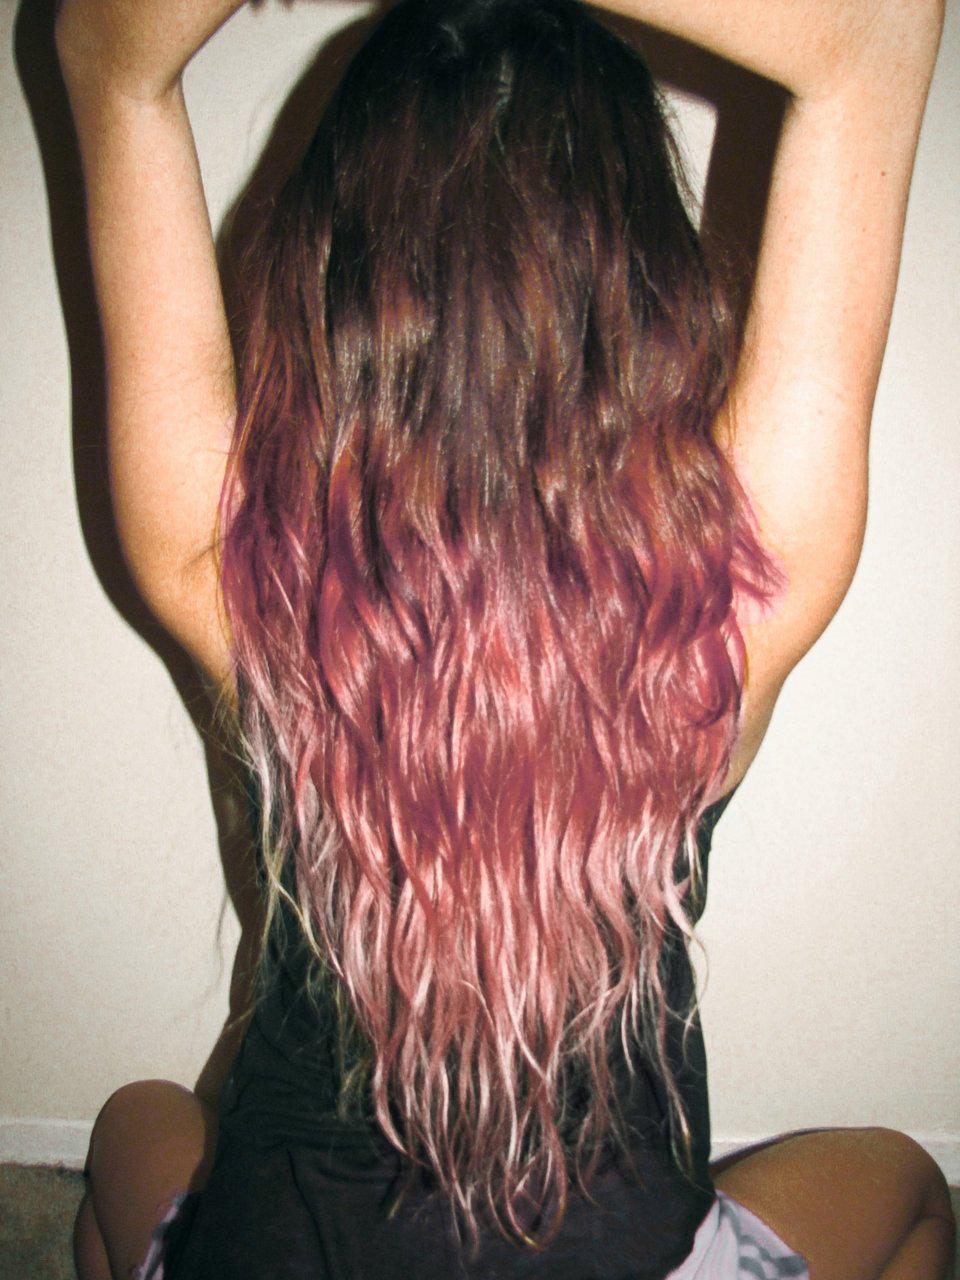 Long ombre hair black brown pink burgandy blonde ohmygod im